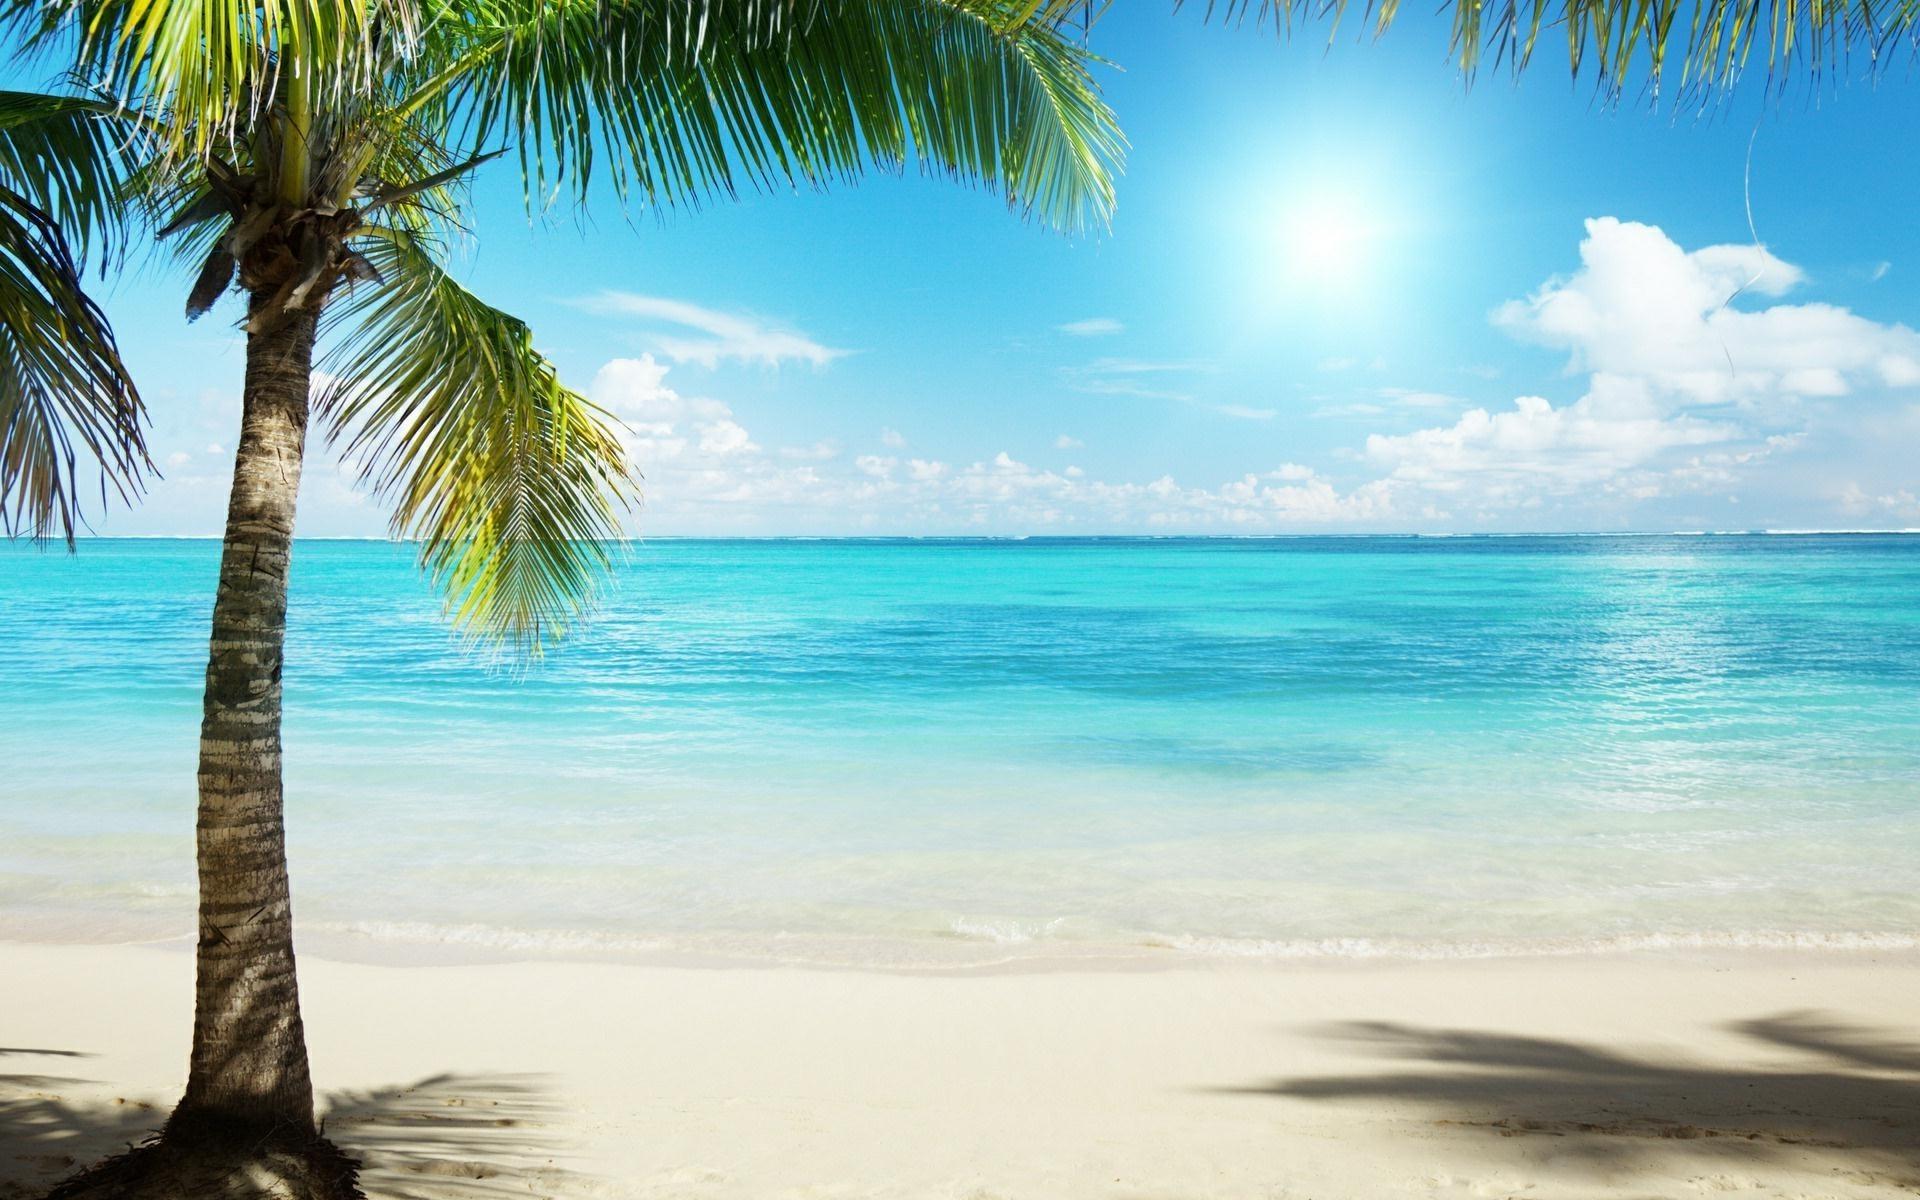 Tropical Beach Background wallpaper | | #6783